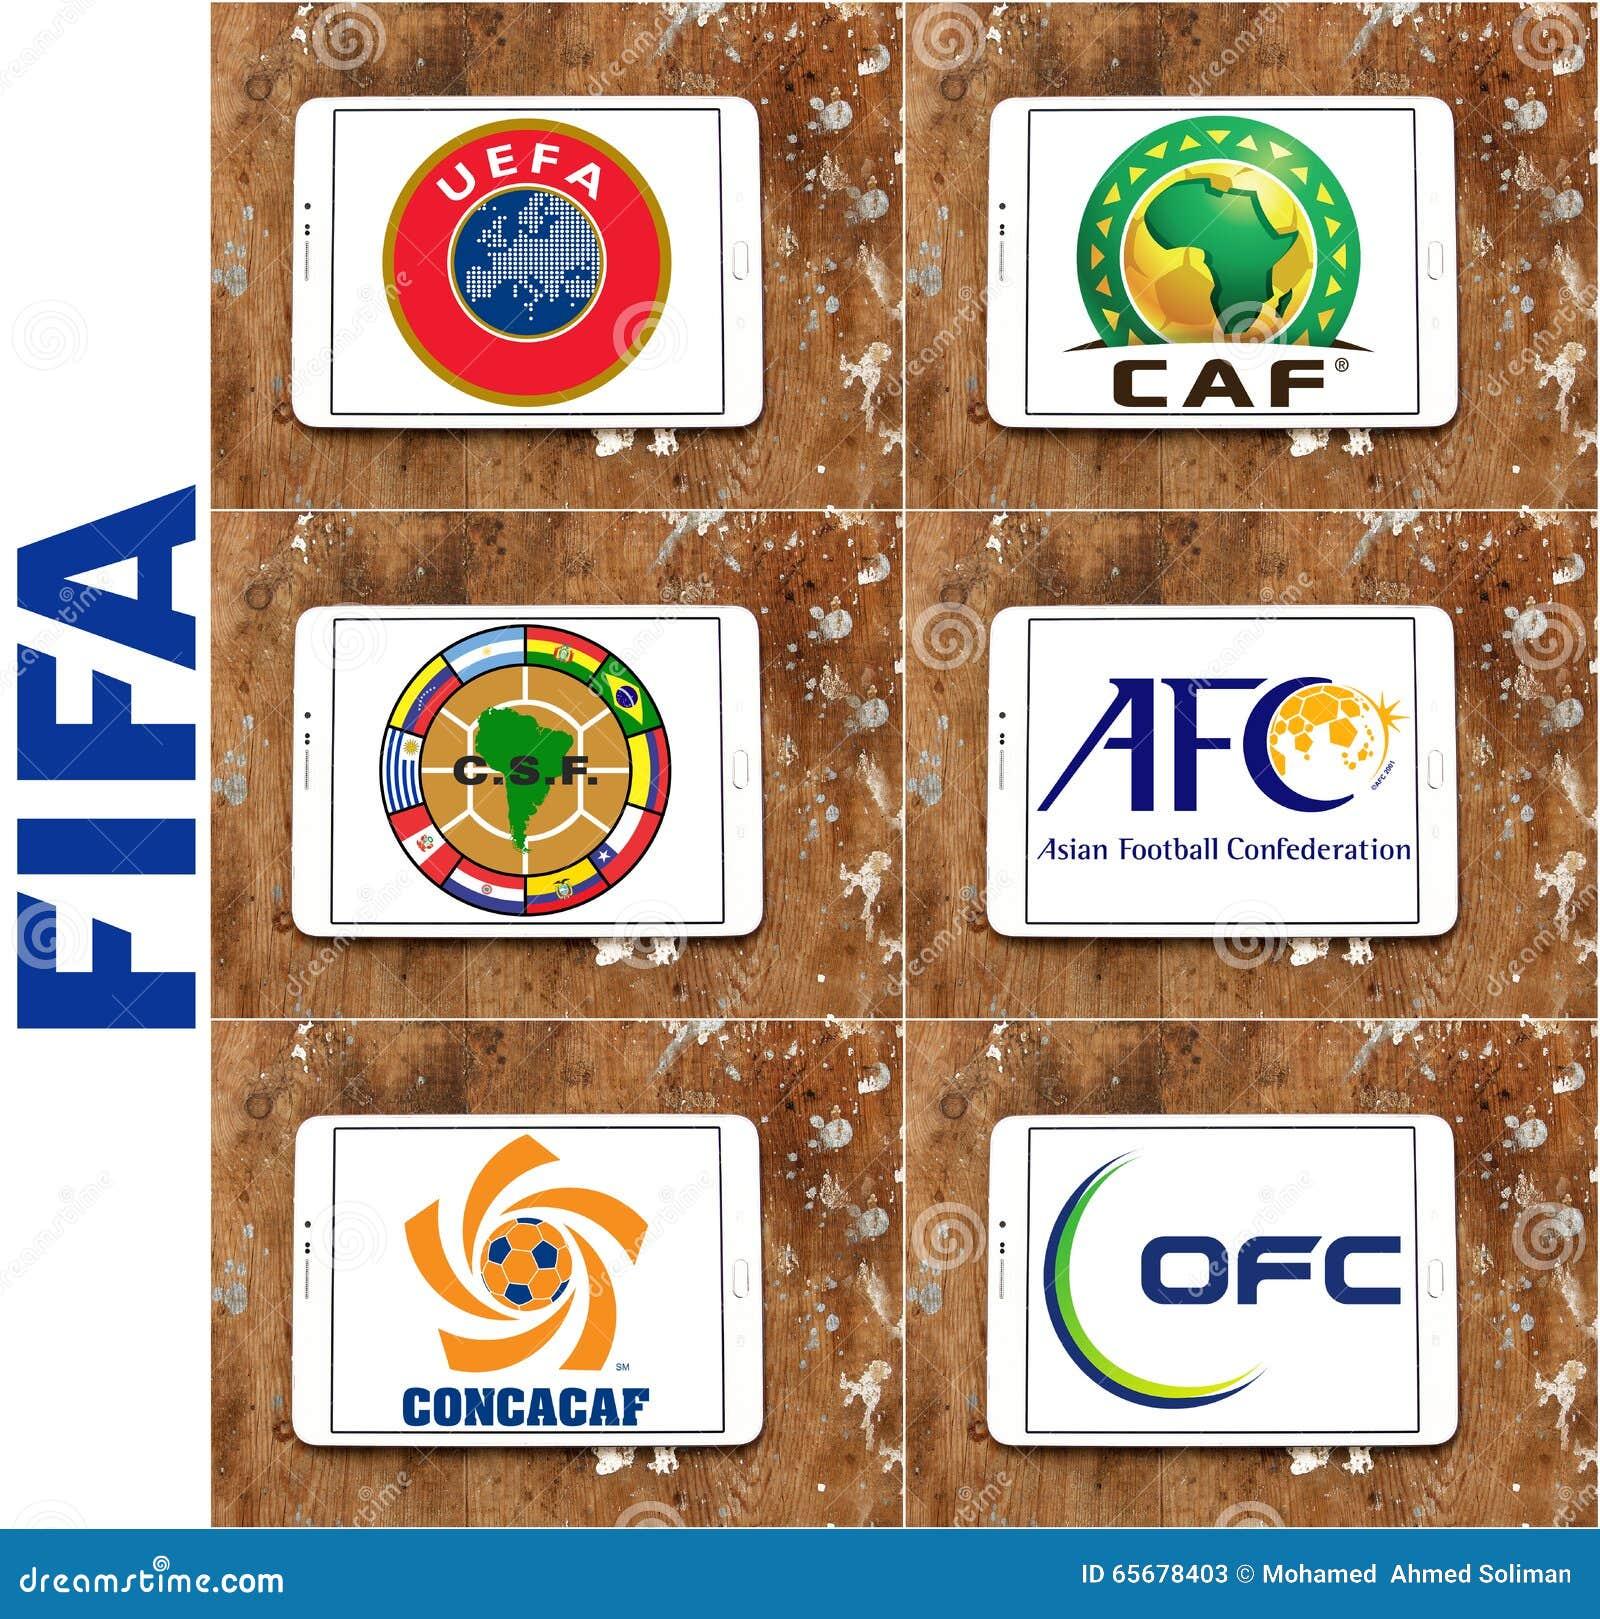 fifa football soccer confederations emblems and logos